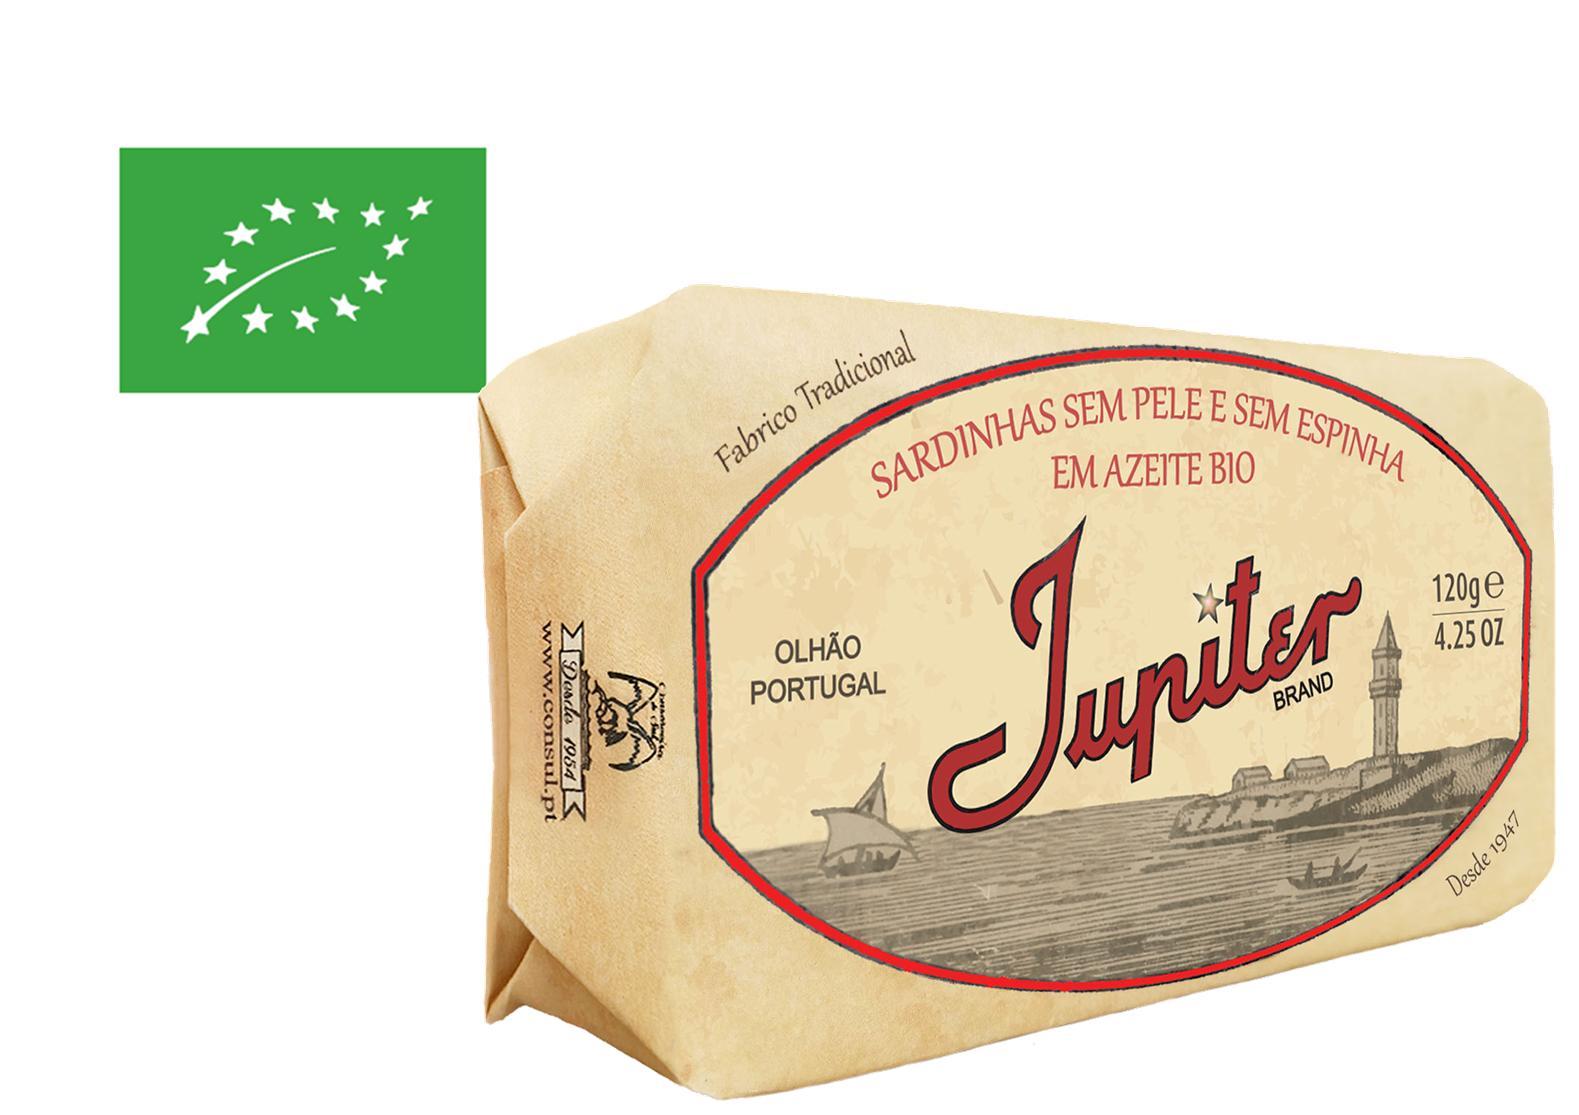 Sardines sans peau ni arêtes à l'huile d'olive bio - Jupiter - Conserveria do Sul - Portugal